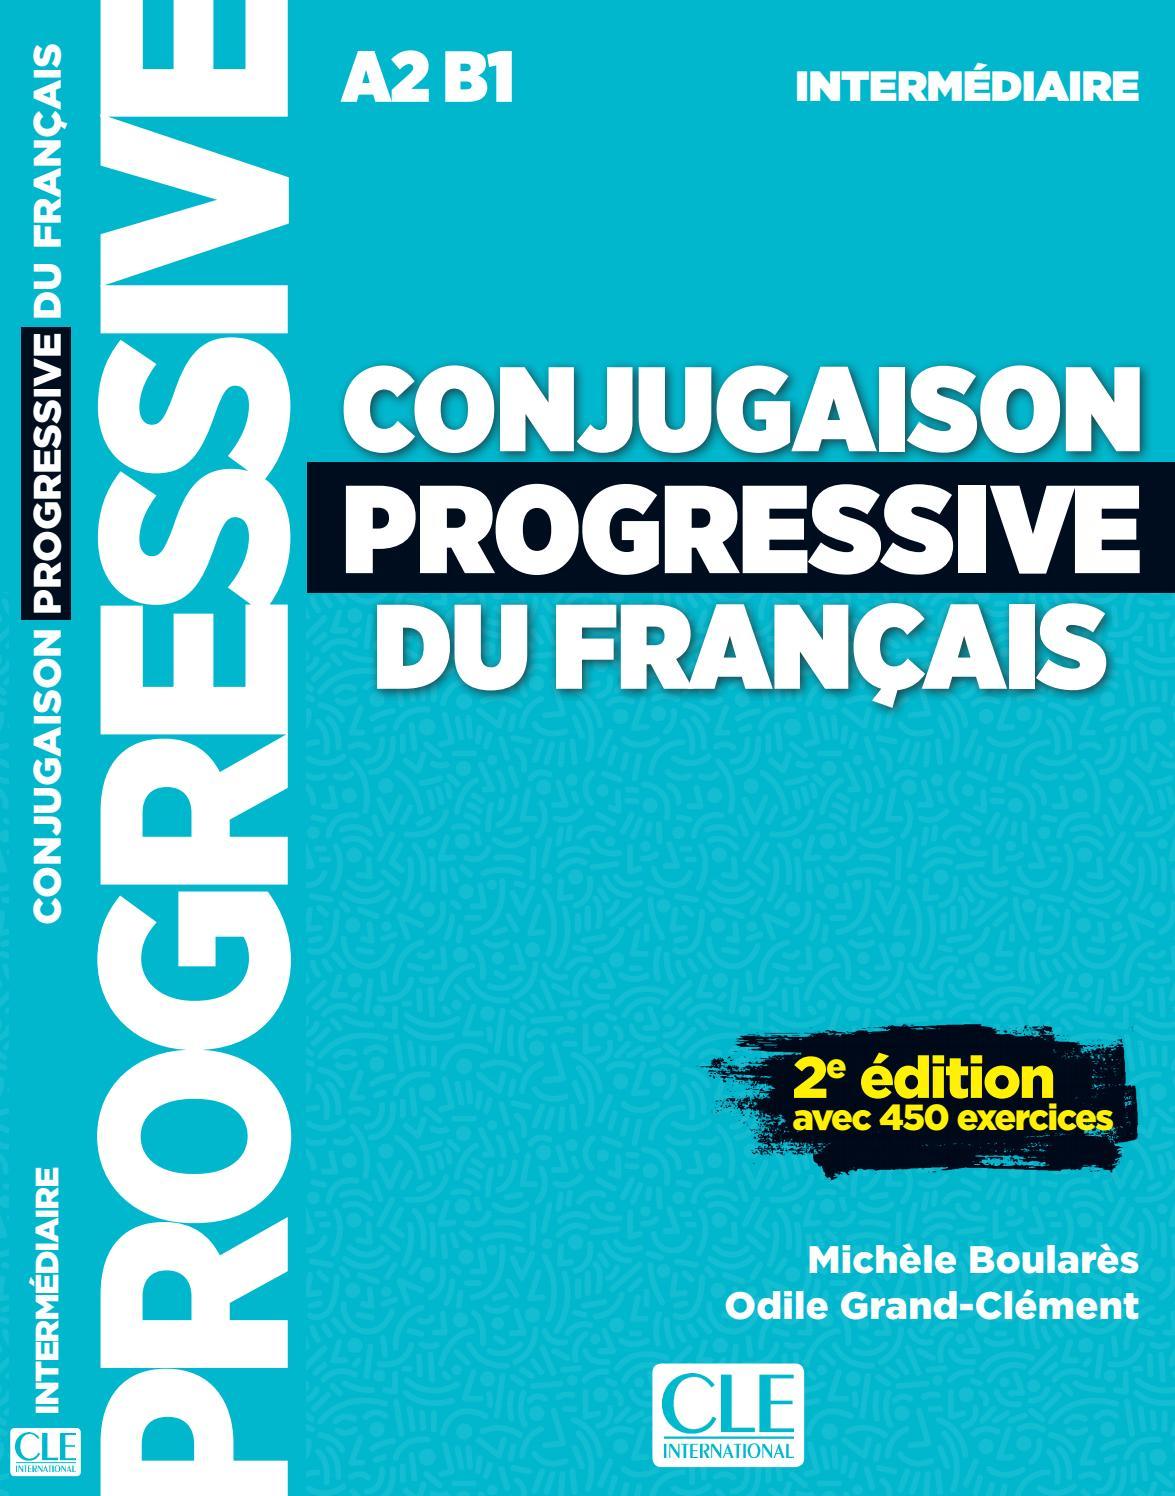 Conjugaison Progressive Intermediaire By Cle International Issuu